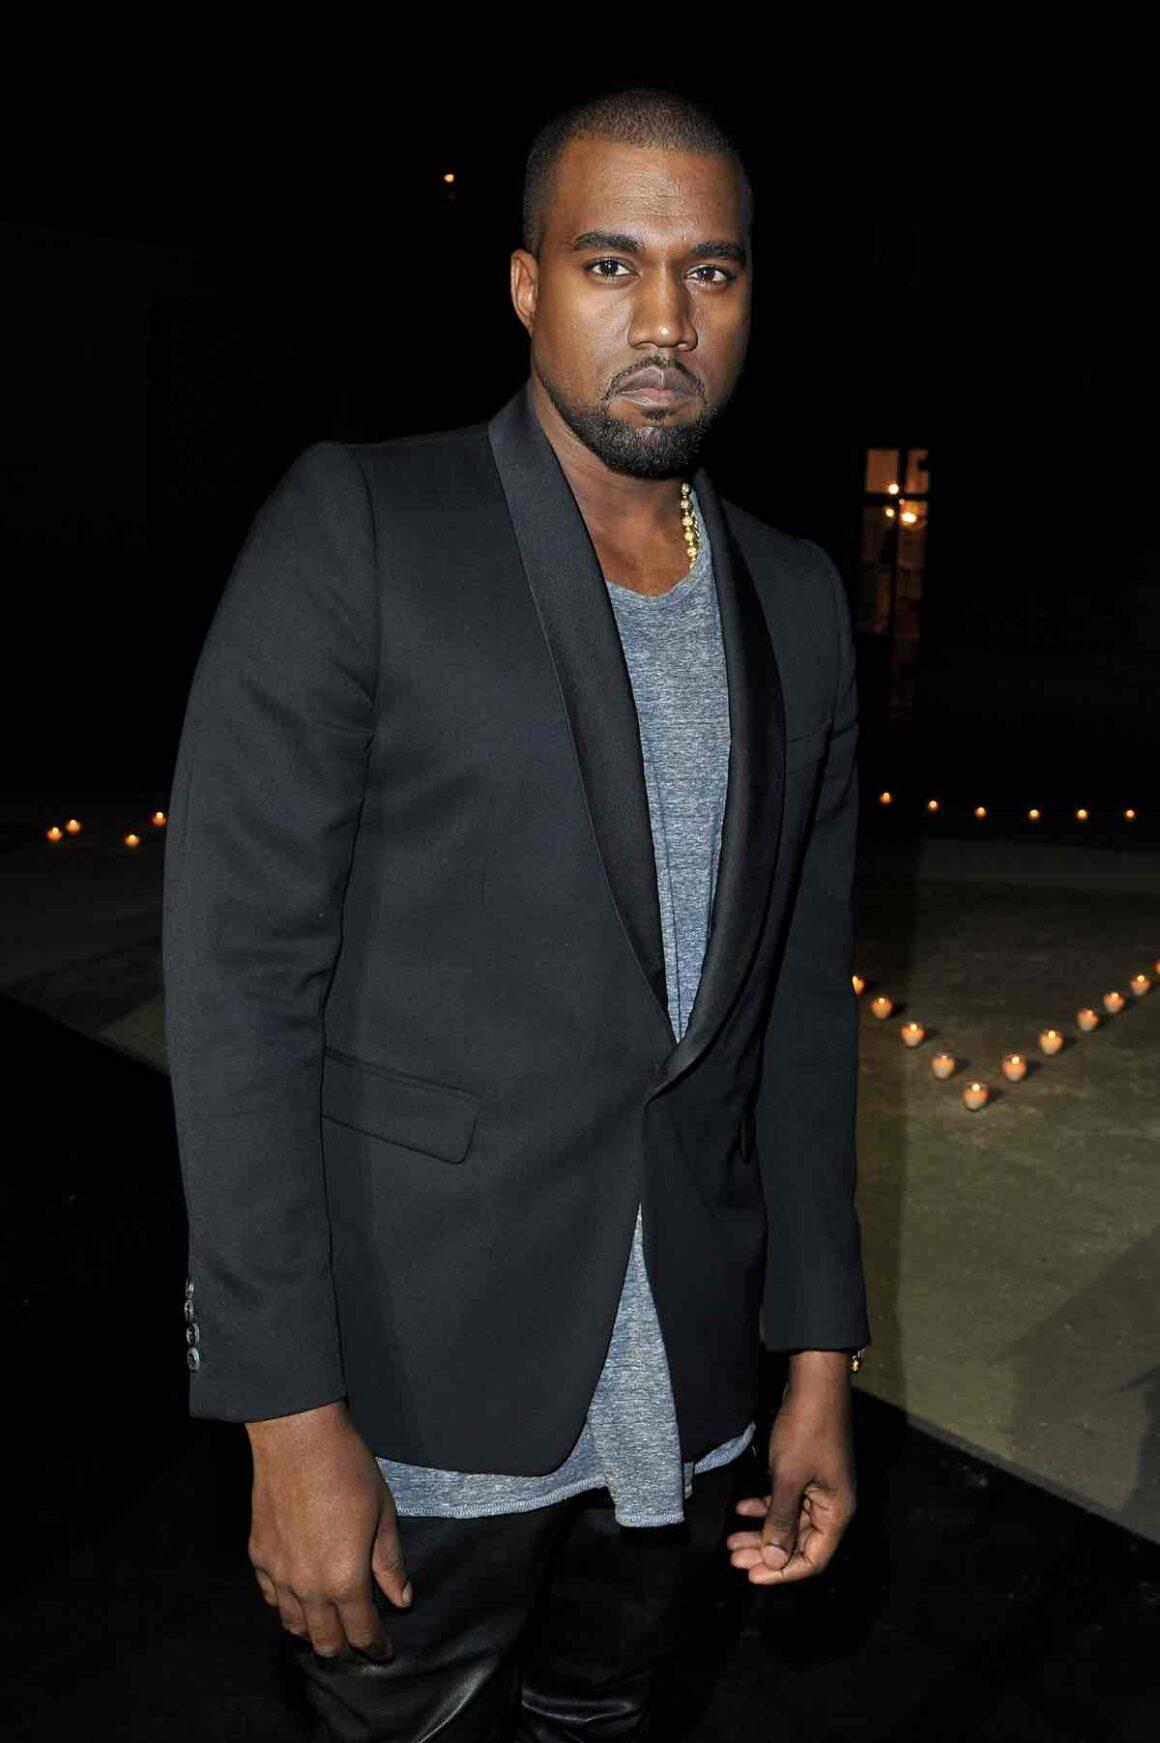 Kanye West MAC & Carine Roitfeld - LE BAL - Paris Fashion Week Womenswear Spring / Summer 2013